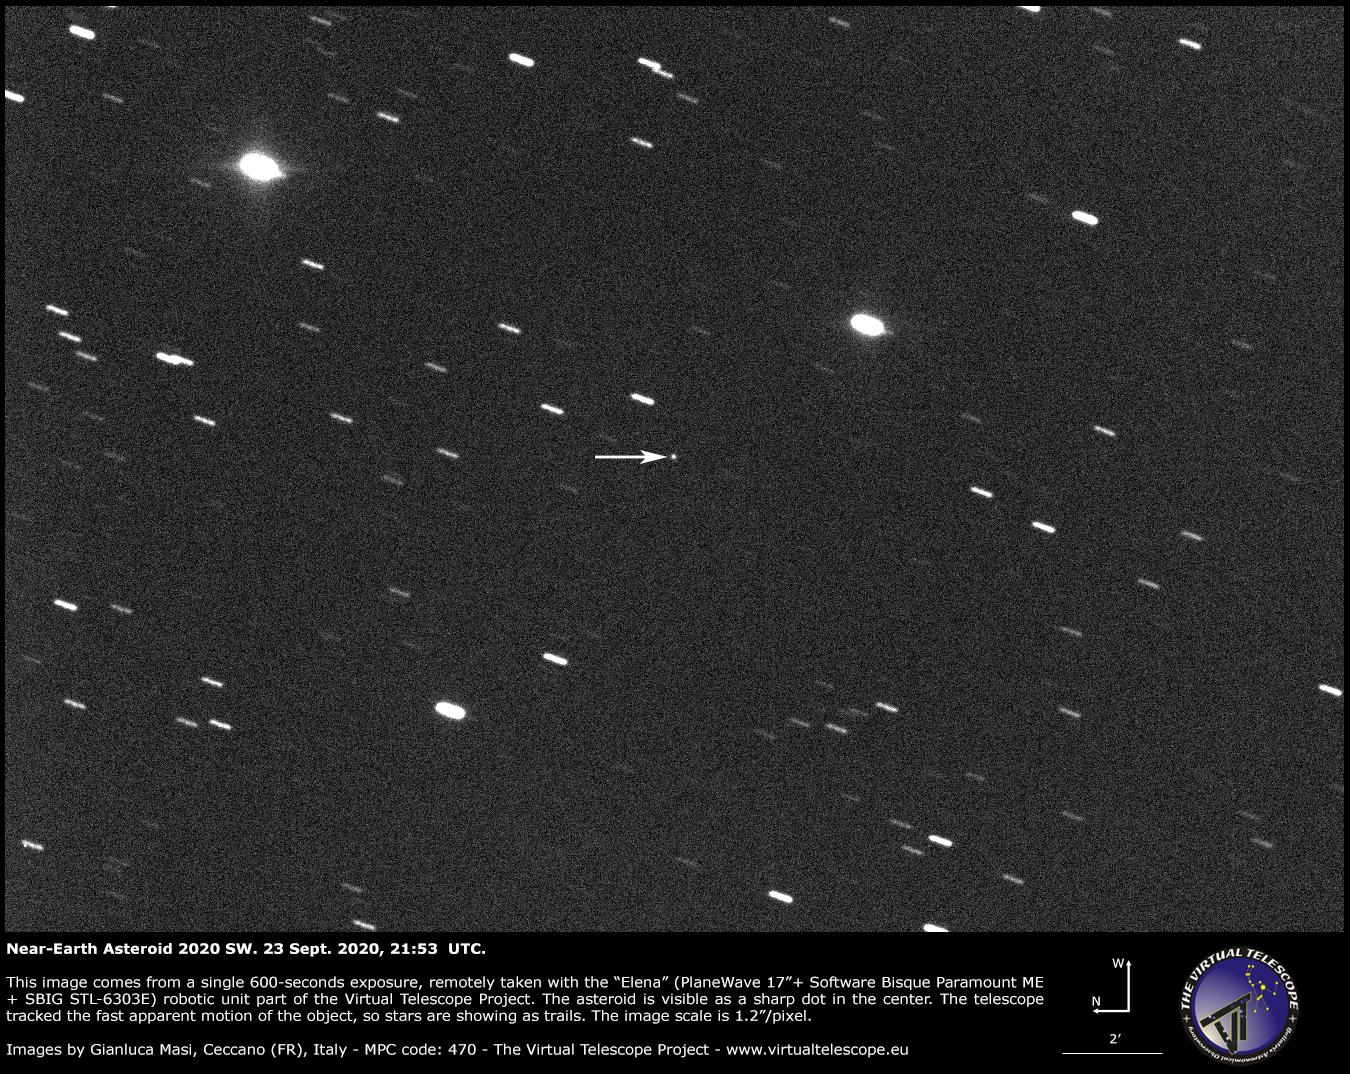 Near-Earth asteroid 2020 SW. 23 Sept. 2020.